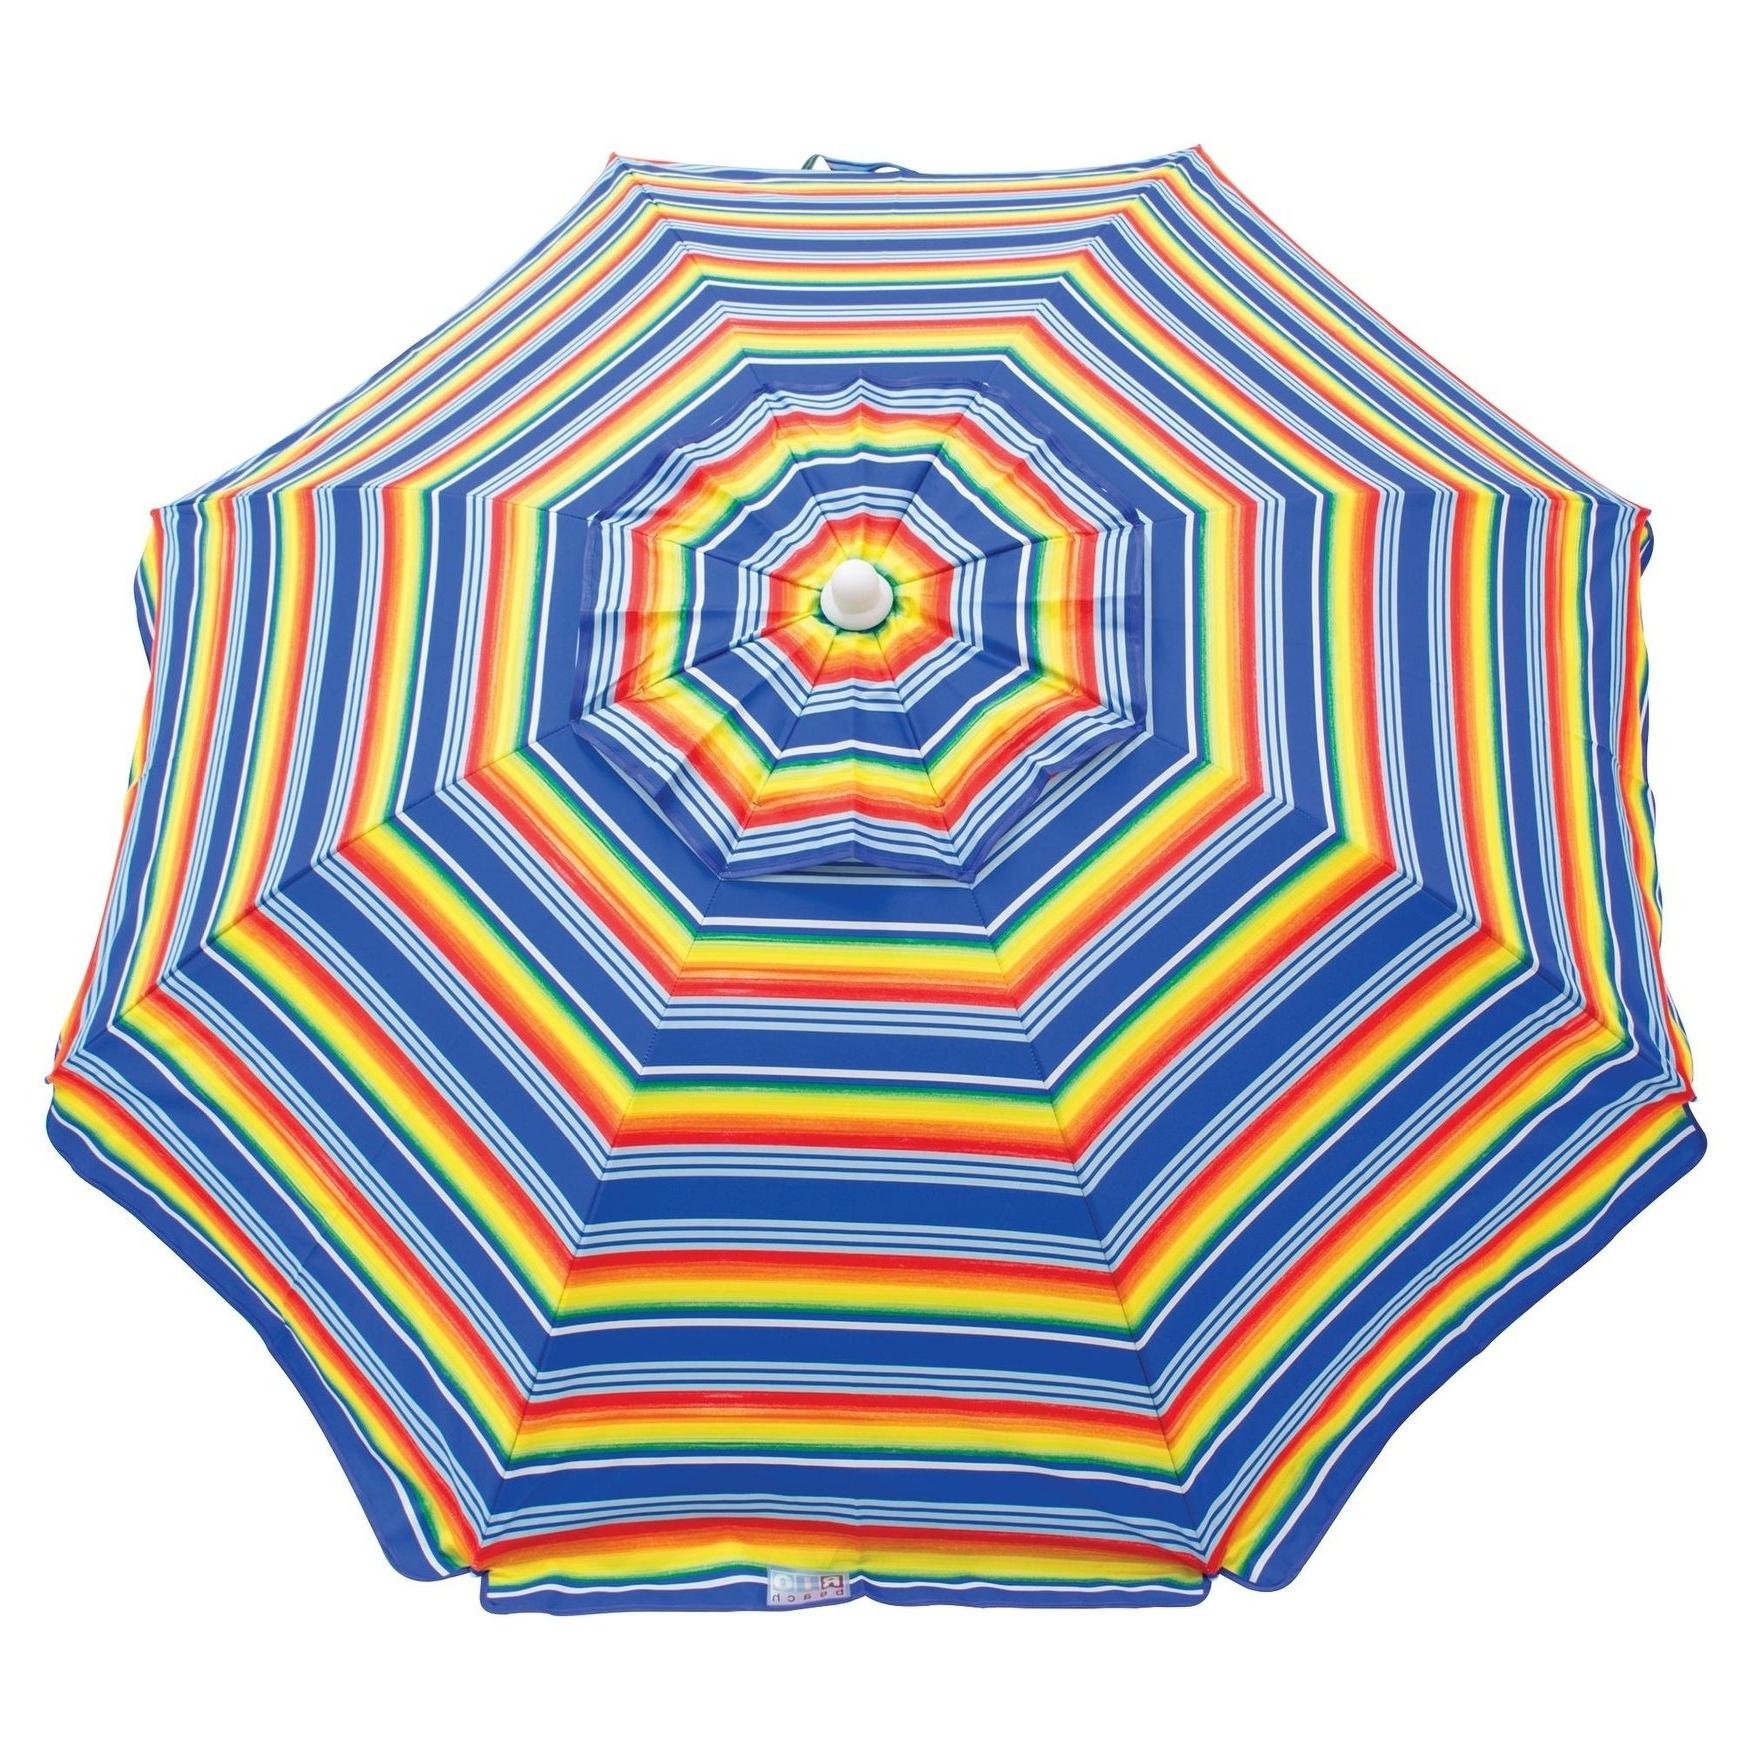 Mucci Madilyn Market Sunbrella Umbrellas In Fashionable Rio Beach 6 Ft. Beach Umbrella With Integrated Sand Anchor (Gallery 20 of 20)